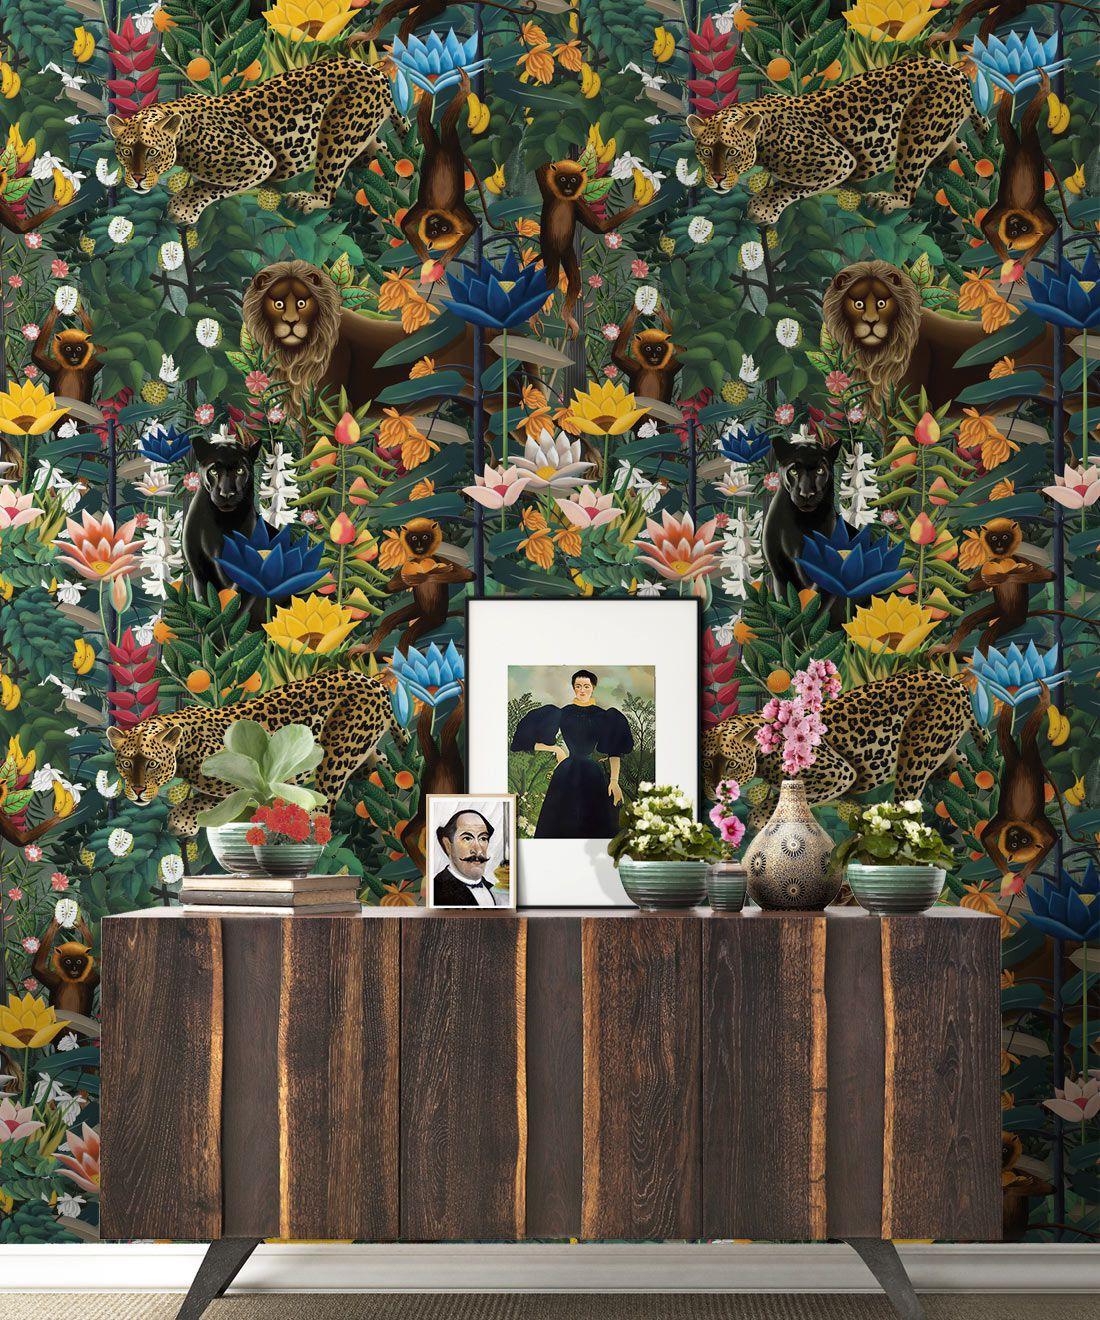 The Jungle Wallpaper • Animal Wallpaper • Botanical Wallpaper • Night Wallpaper • Insitu